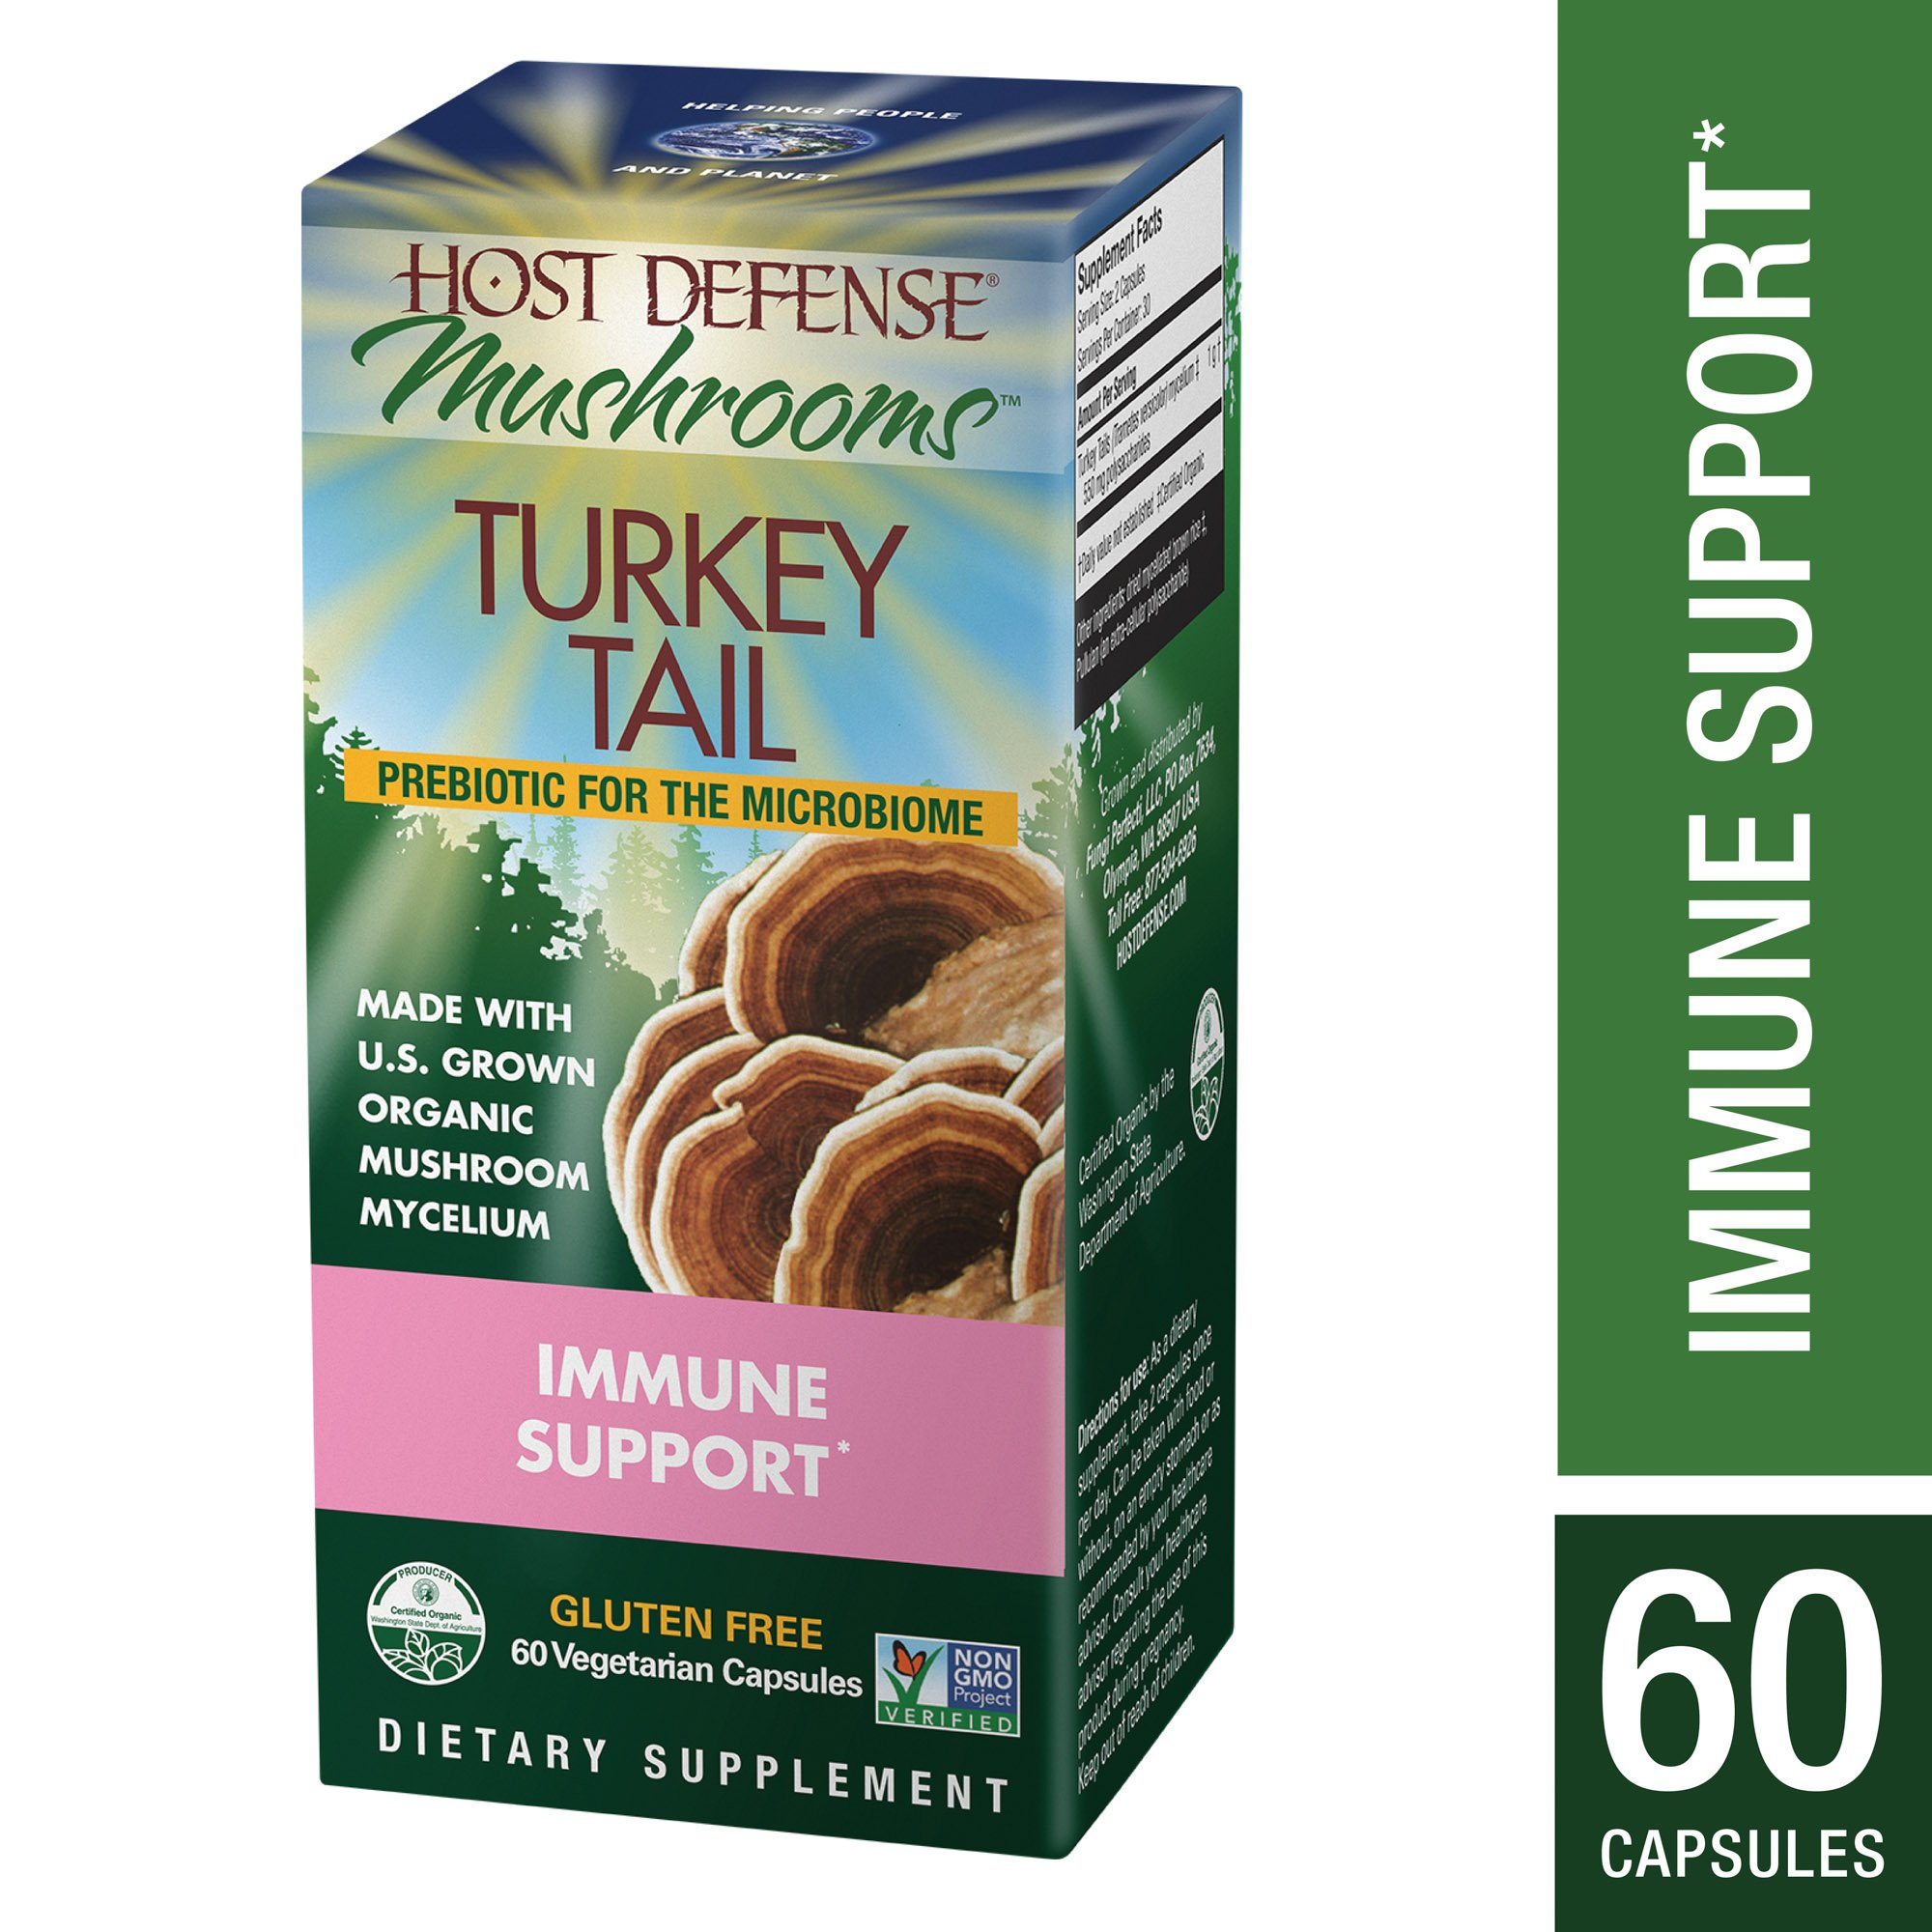 Host Defense - Turkey Tail Capsules, Mushroom Support for Immune Response, 60 Count (FFP)